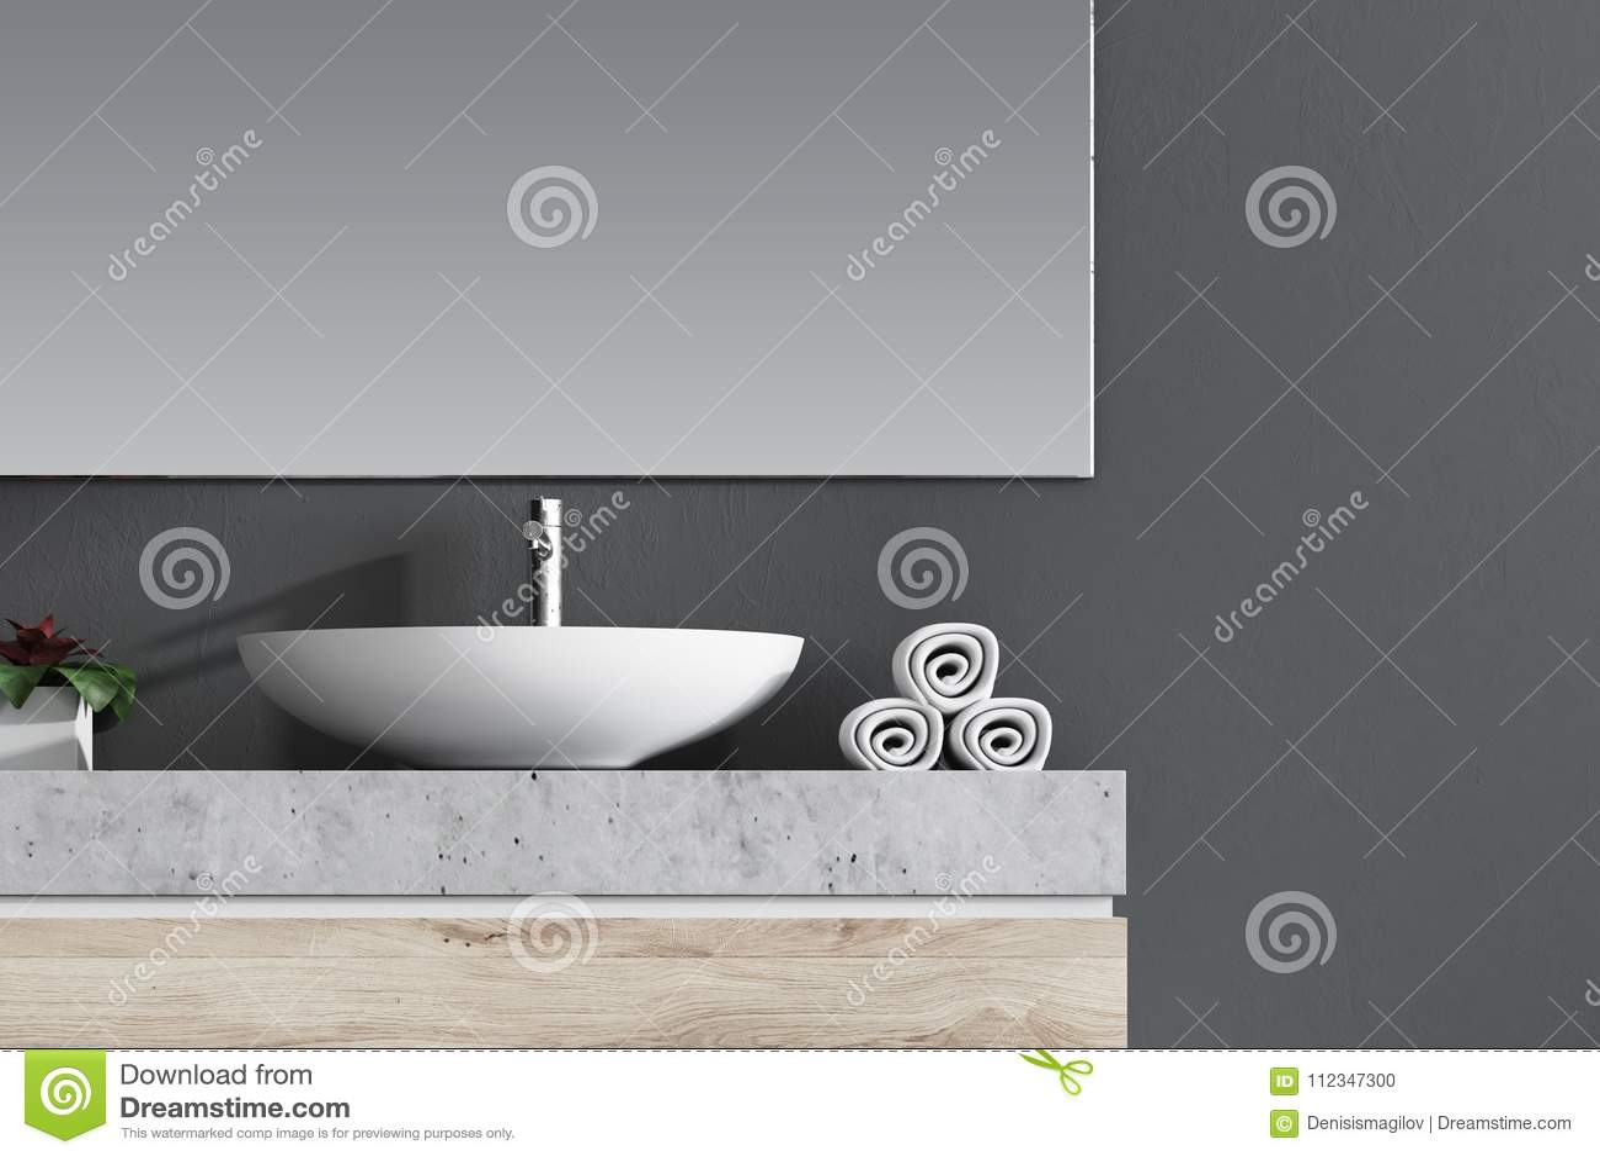 White sink in a gray bathroom stock illustration - Large horizontal bathroom mirrors ...